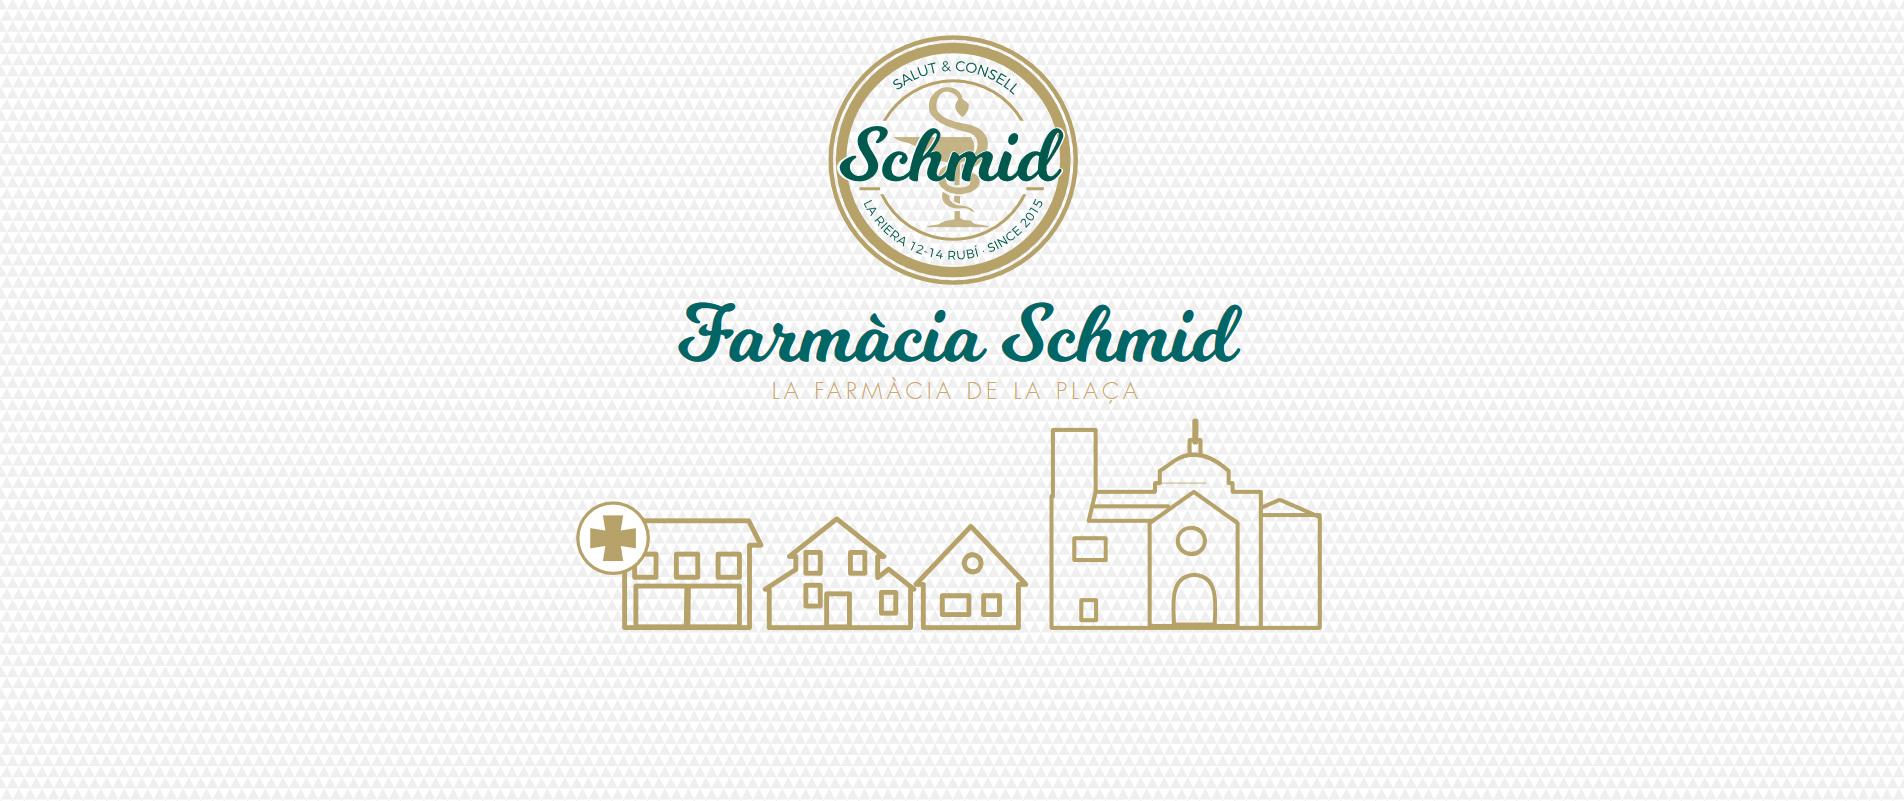 Farmacia-schmid